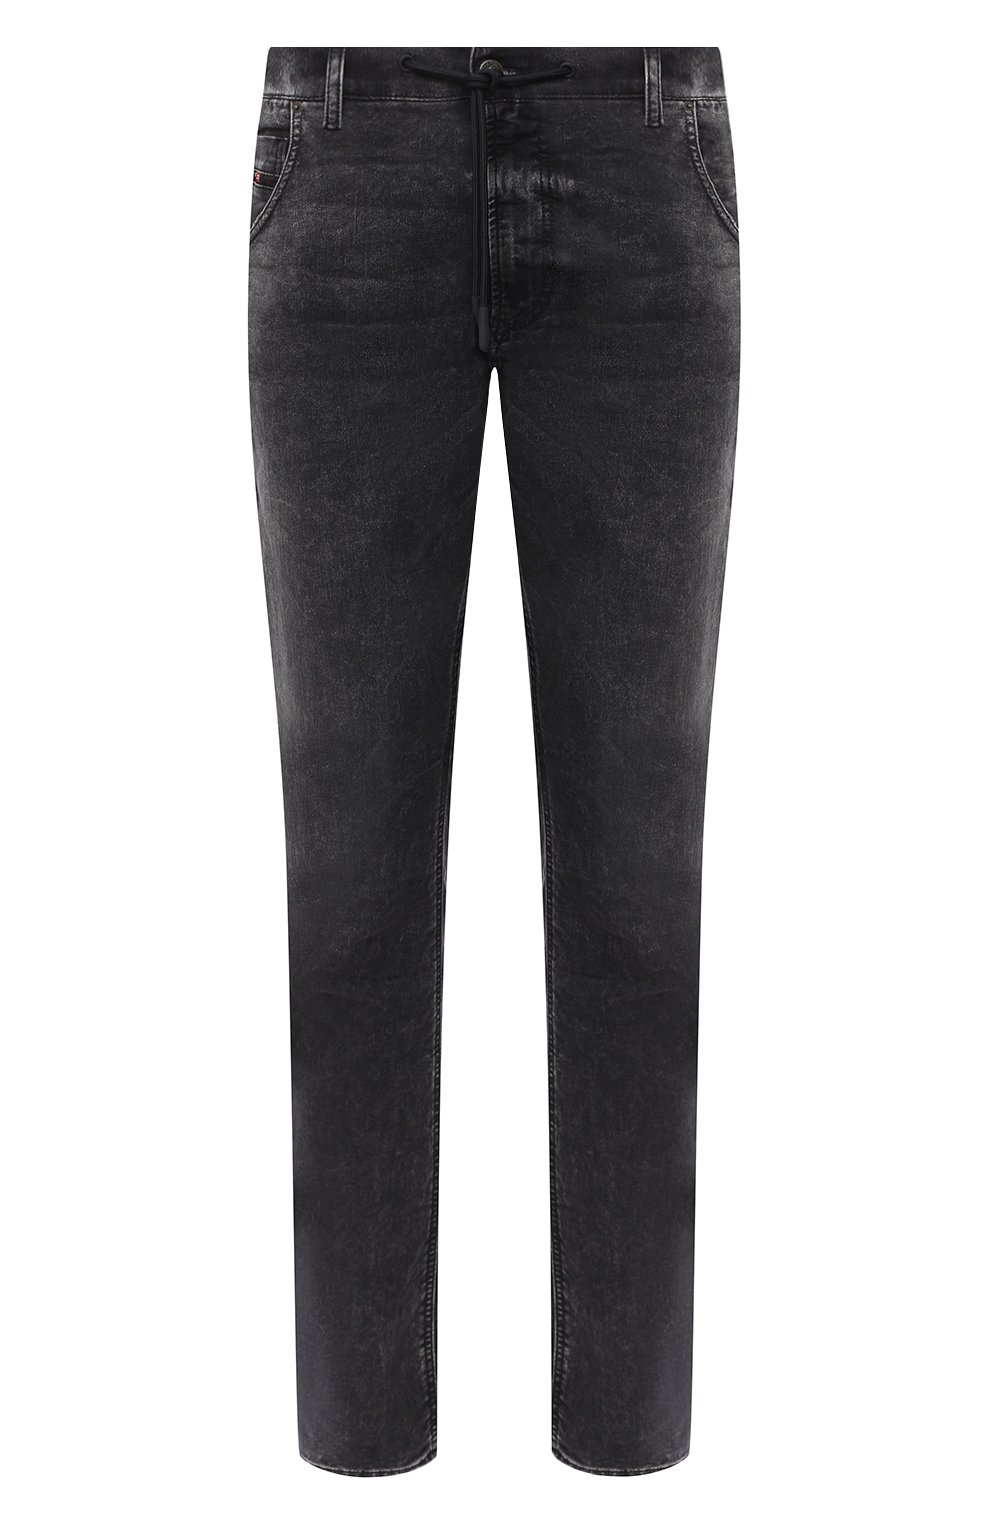 Мужские джинсы DIESEL темно-серого цвета, арт. A00088/009FZ   Фото 1